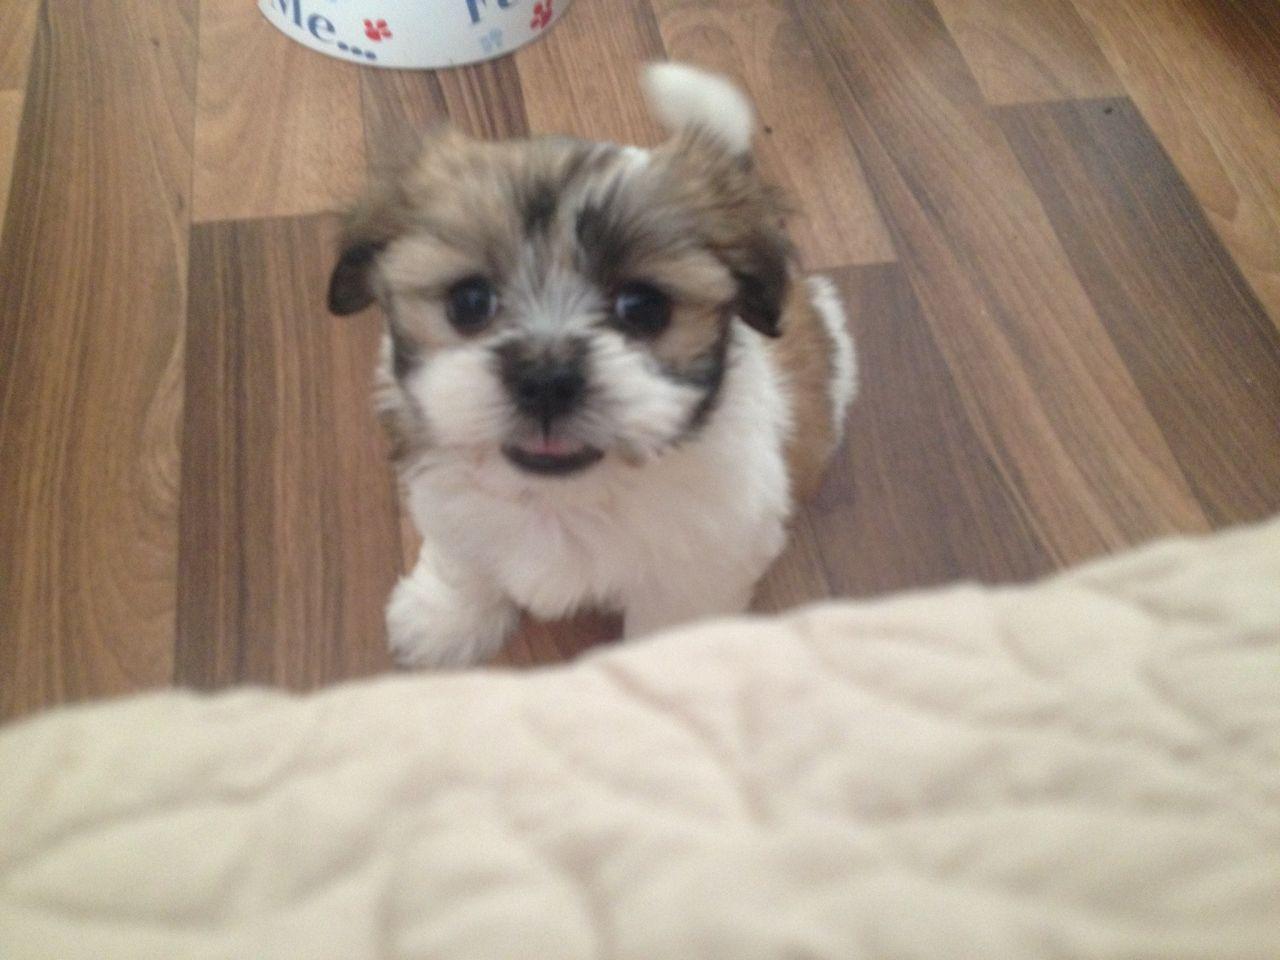 Kyi-Leo Puppies: Kyi Leo Lhasa Apso X Maltese Terrier Kyi Leo Puppies Rotherham Breed